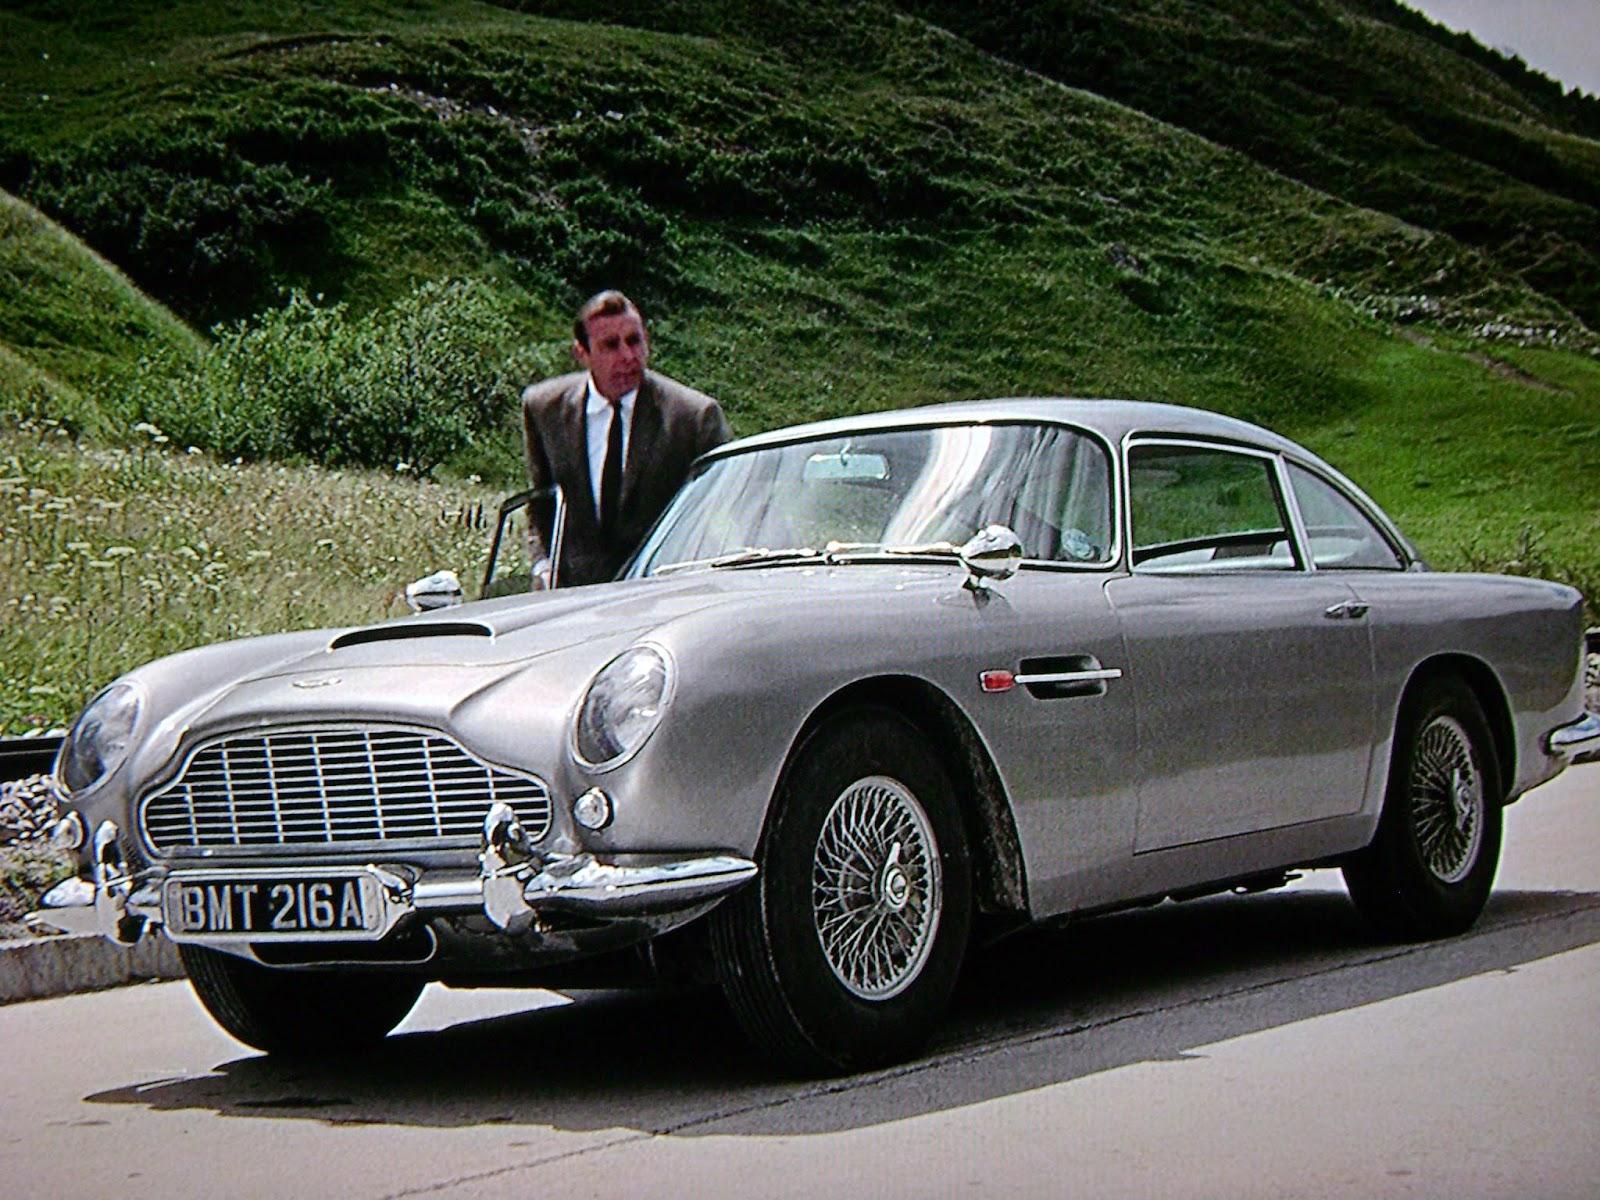 007 Vehicle Aston Martin Db5 Goldfinger on Number Line 1 100